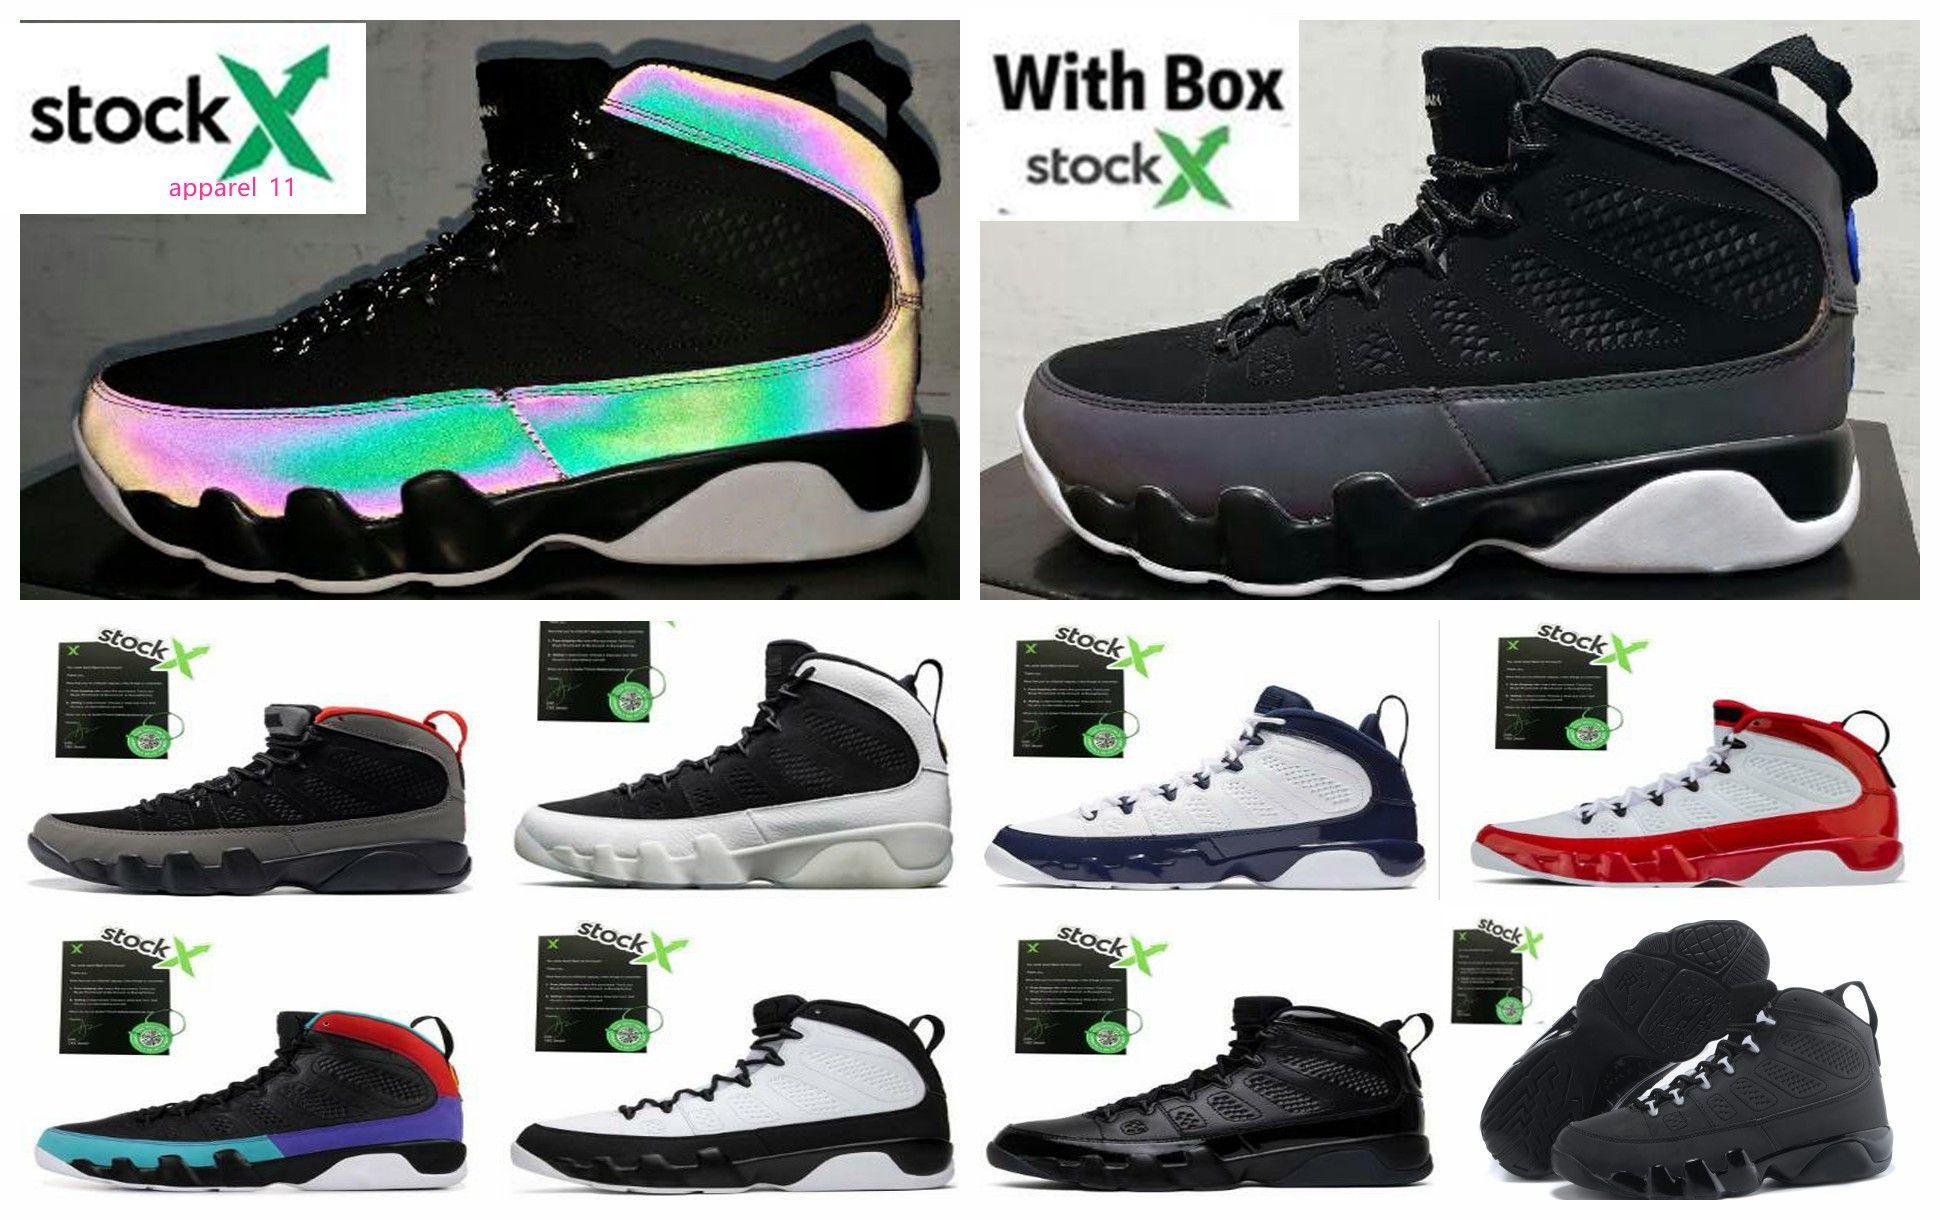 9 Racer Blue Men Basketball-Schuh-9s Gym Red Dream Es Do It UNC Space Jam Chameleon Sport Sneaker mit freiem shippment